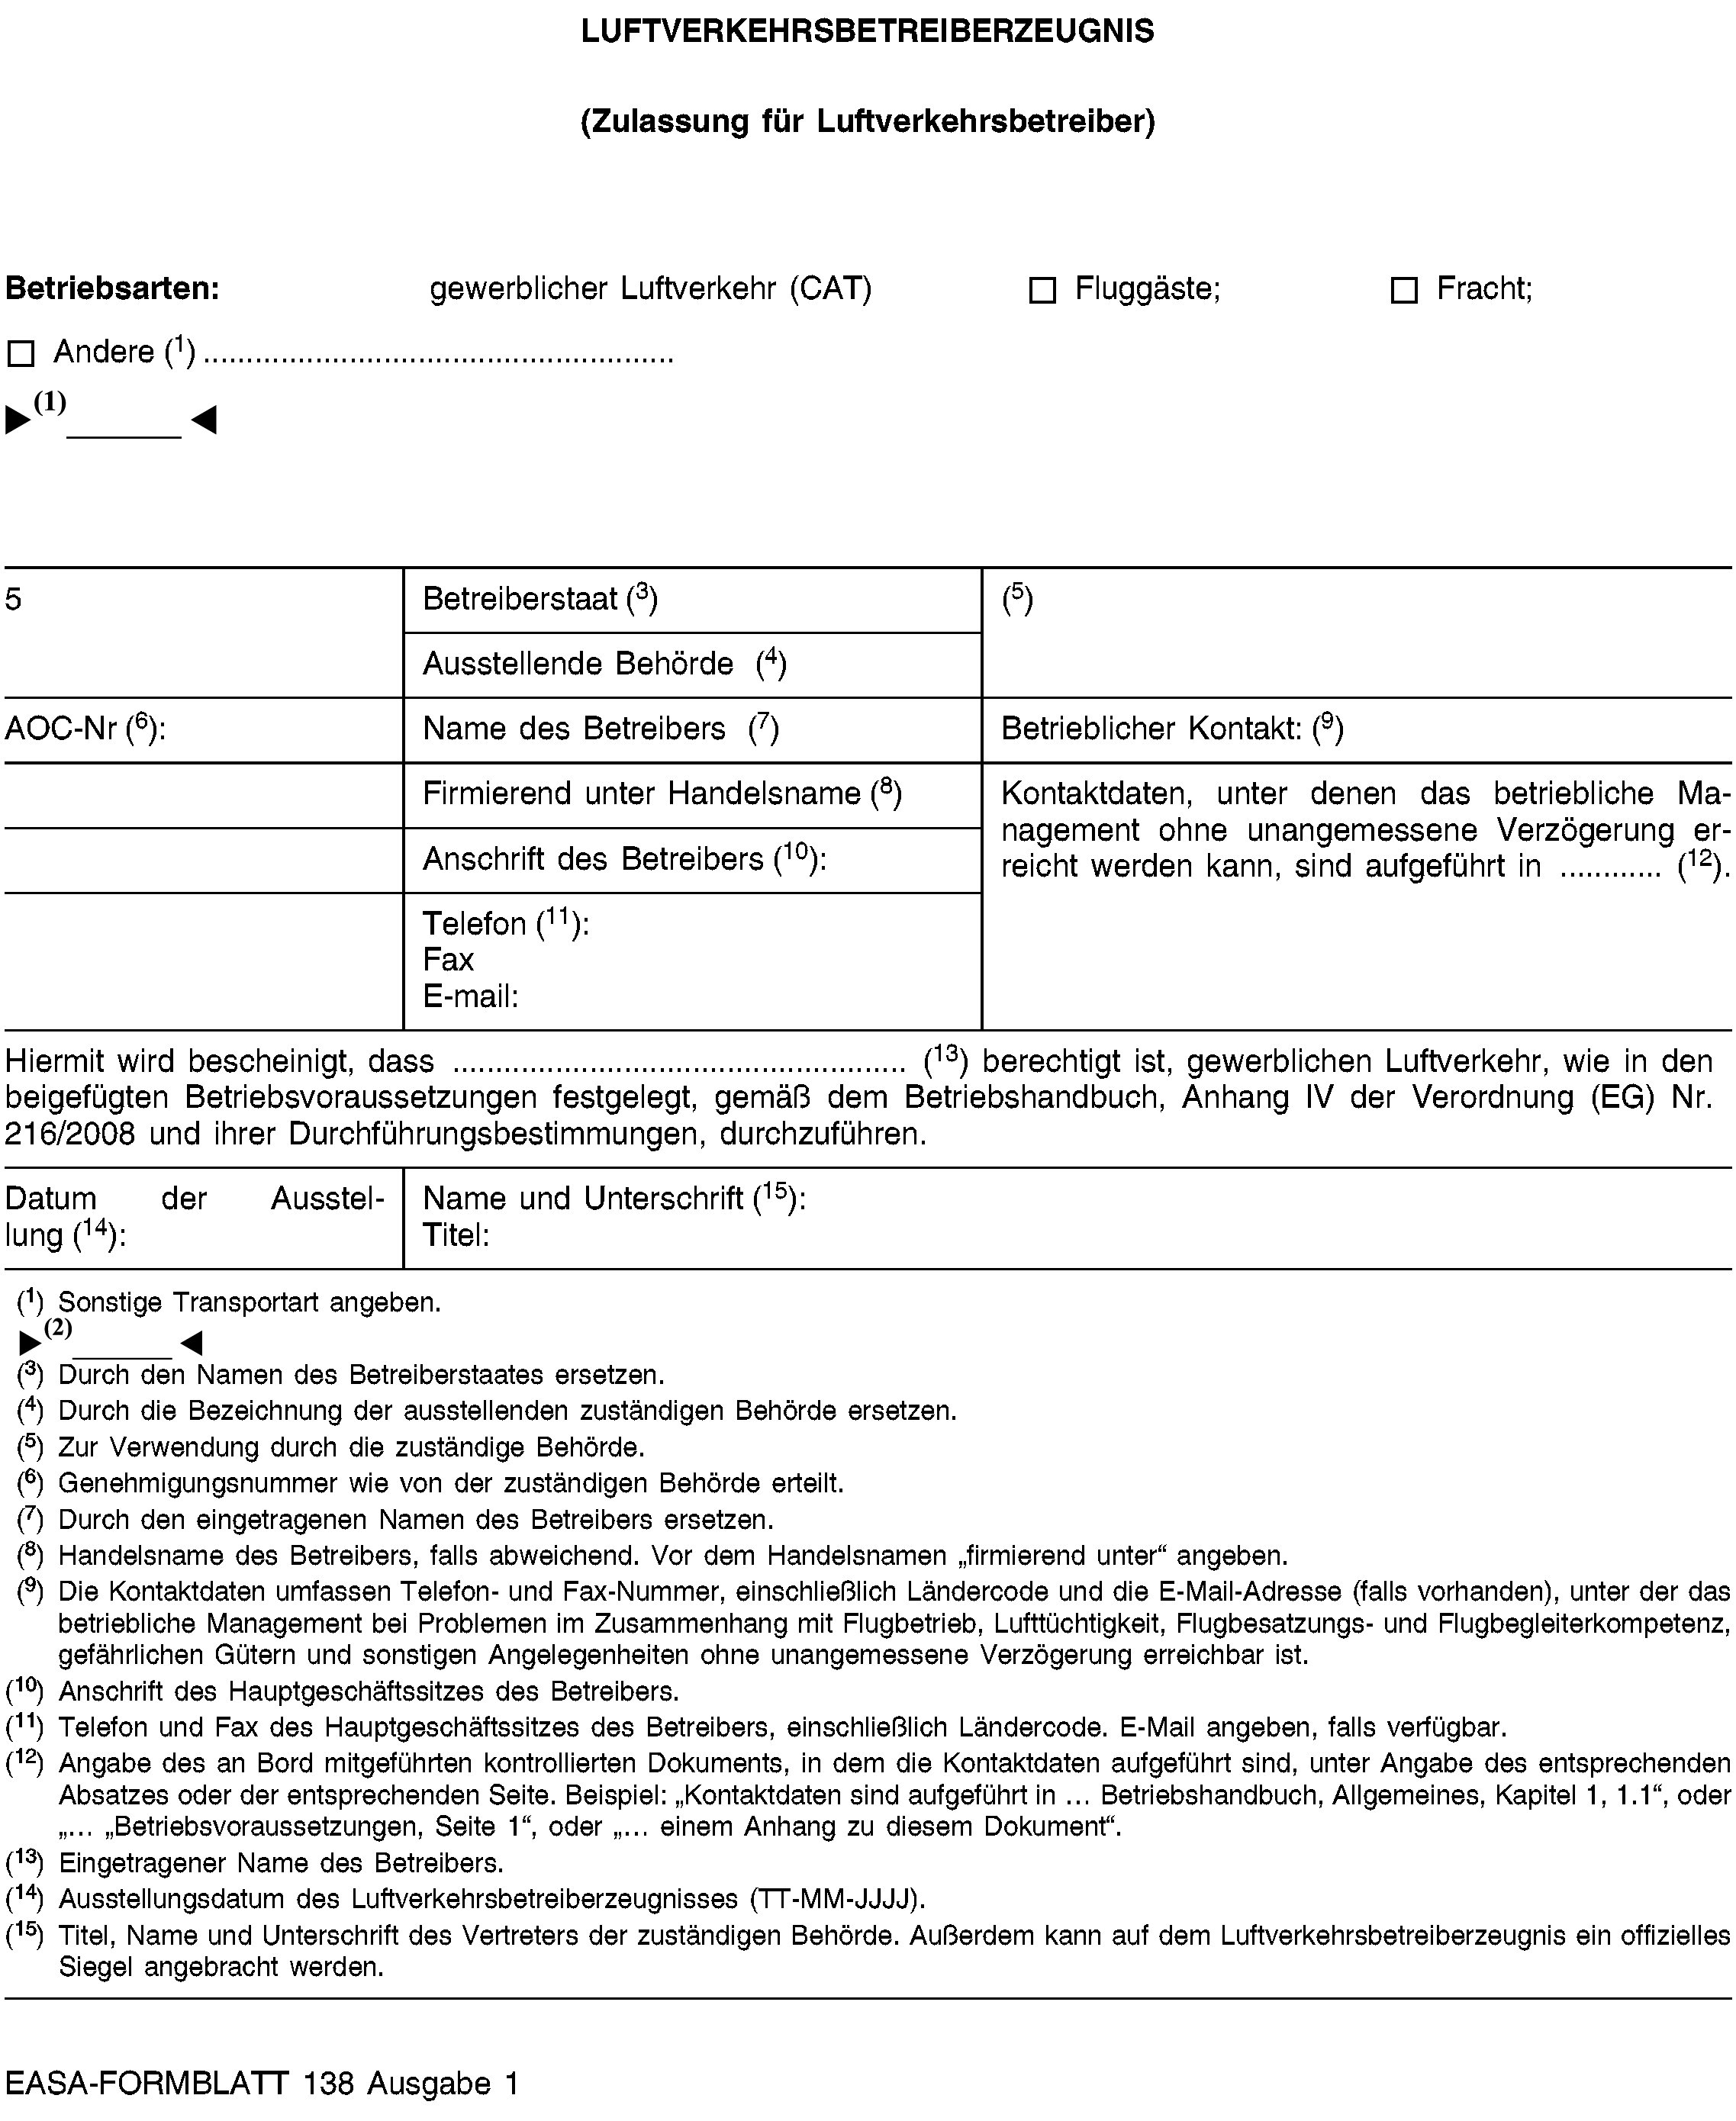 EUR-Lex - 02012R0965-20170322 - EN - EUR-Lex